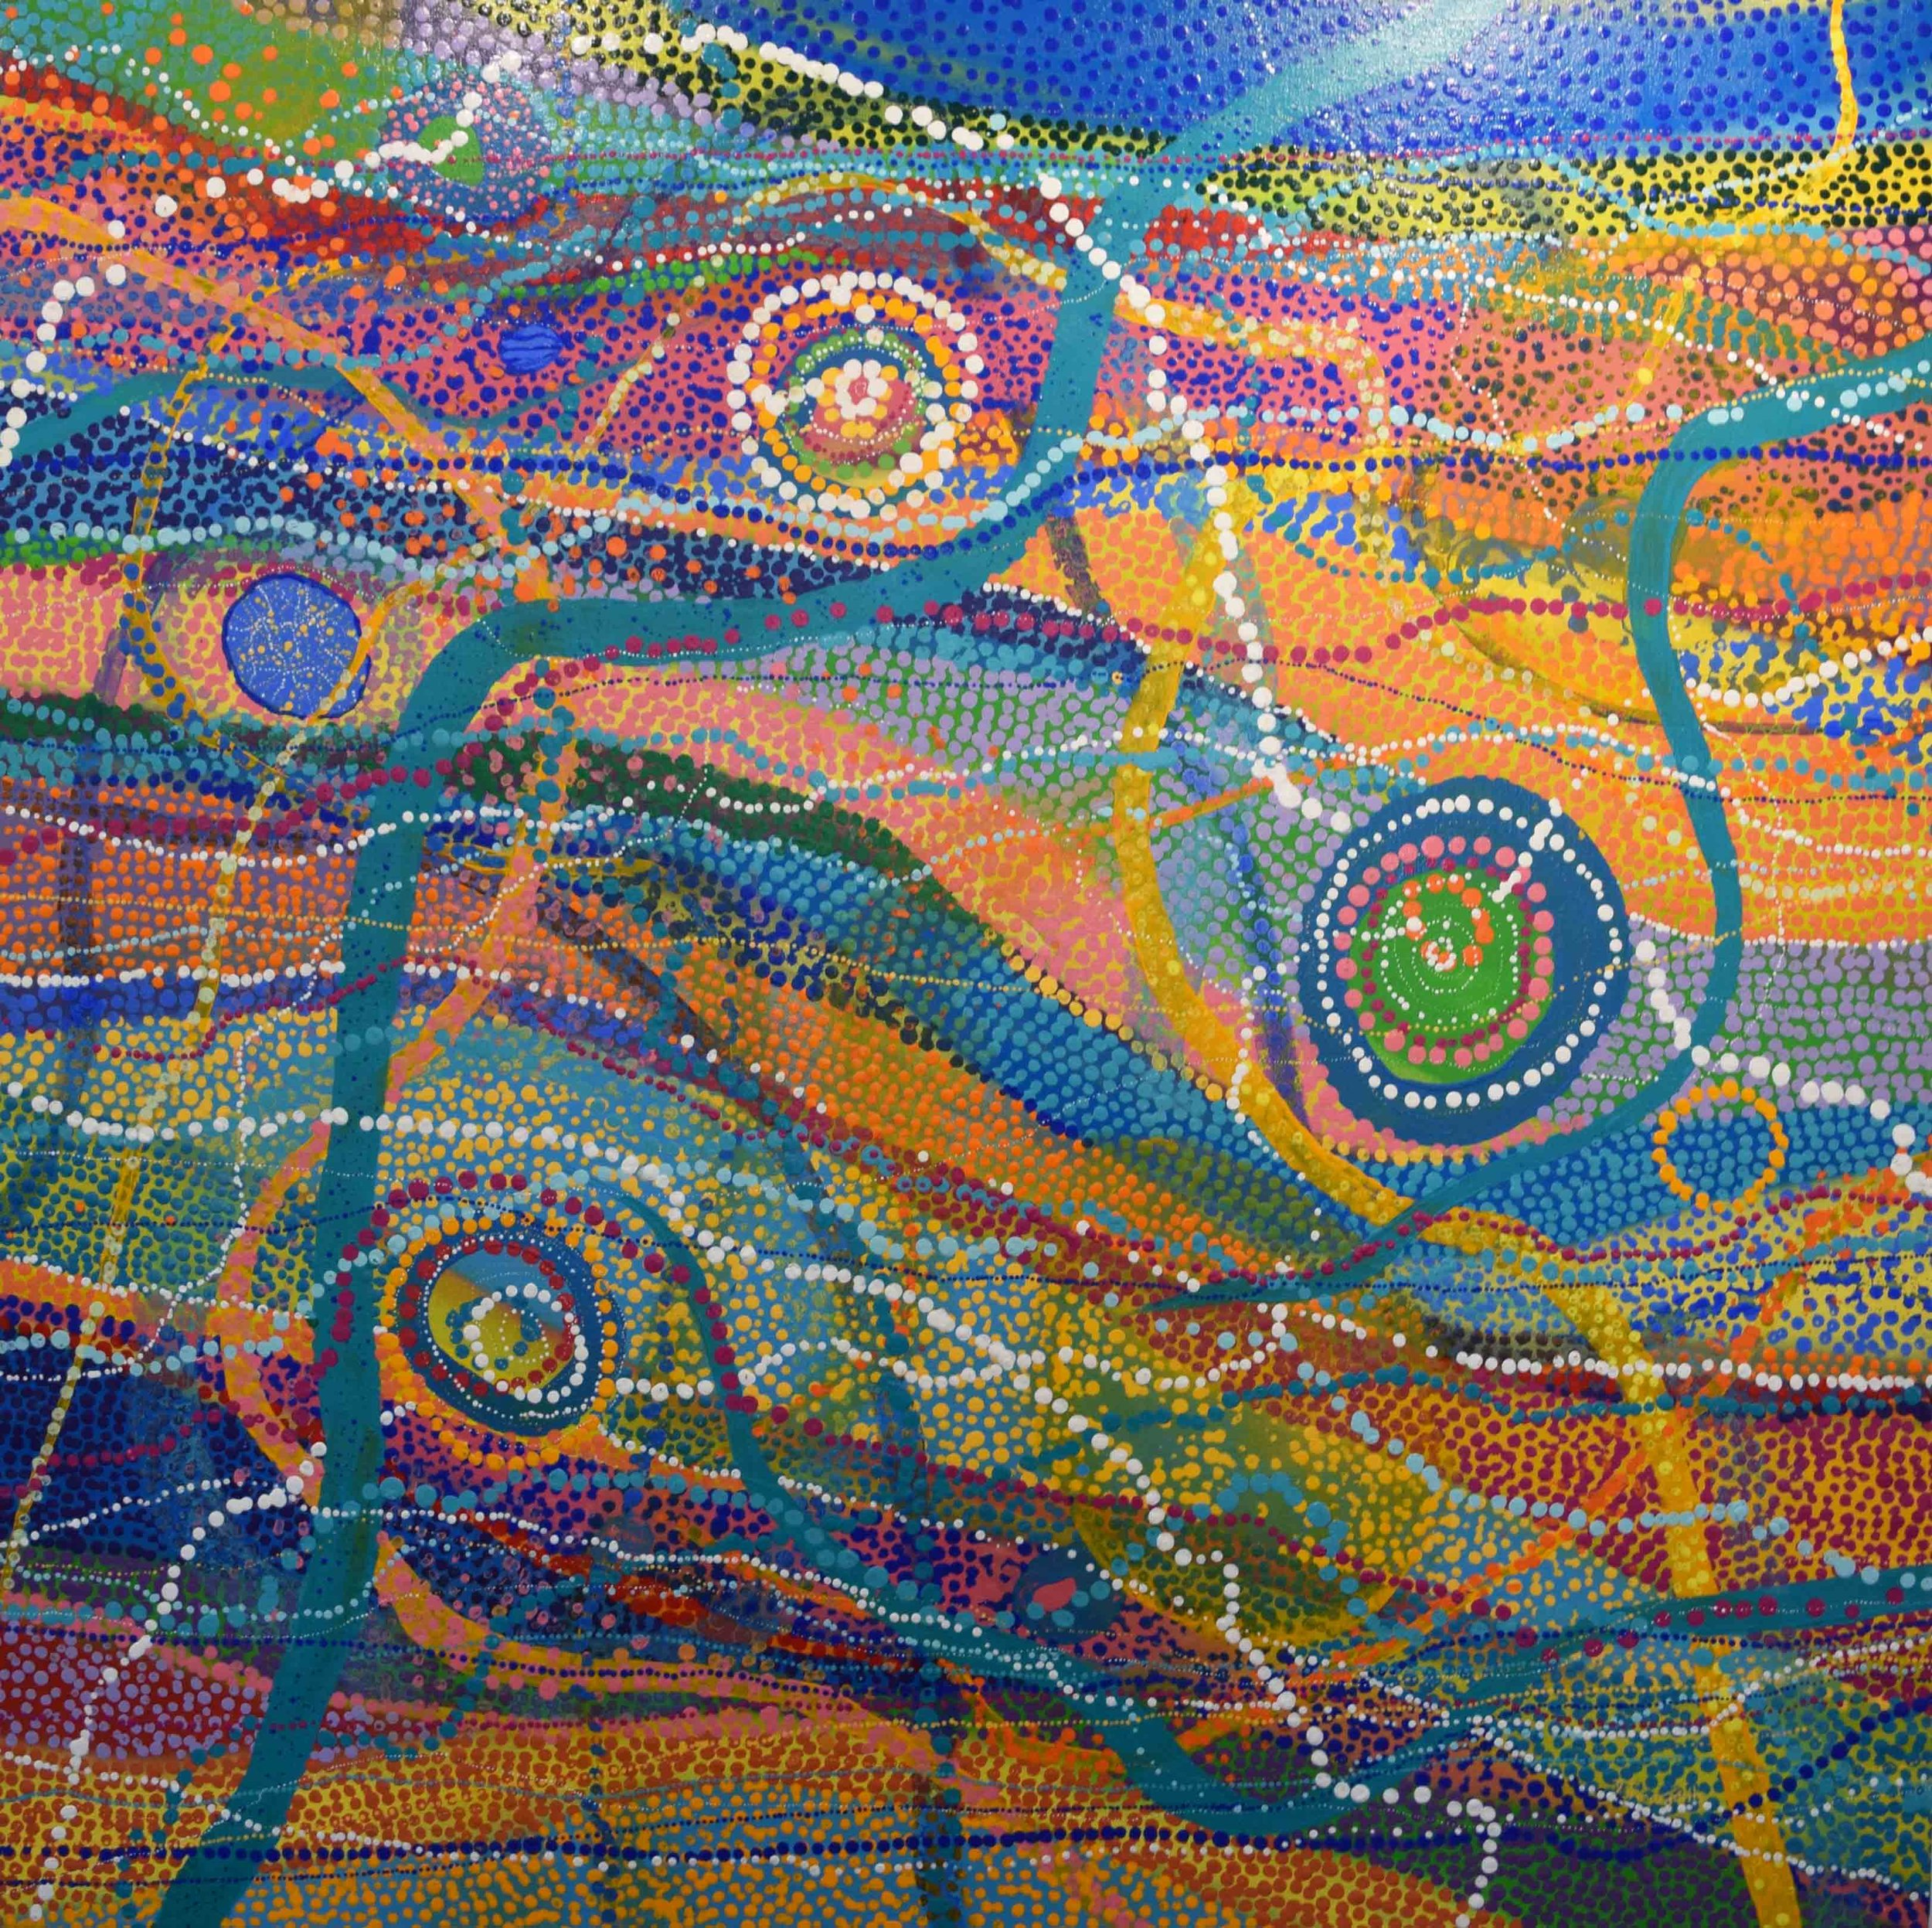 21. Deborah Bonar-Mills,  Beautiful Ocean Beaches,  2019, mixed media on Belgian linen, 102 x 102 cm $4,310